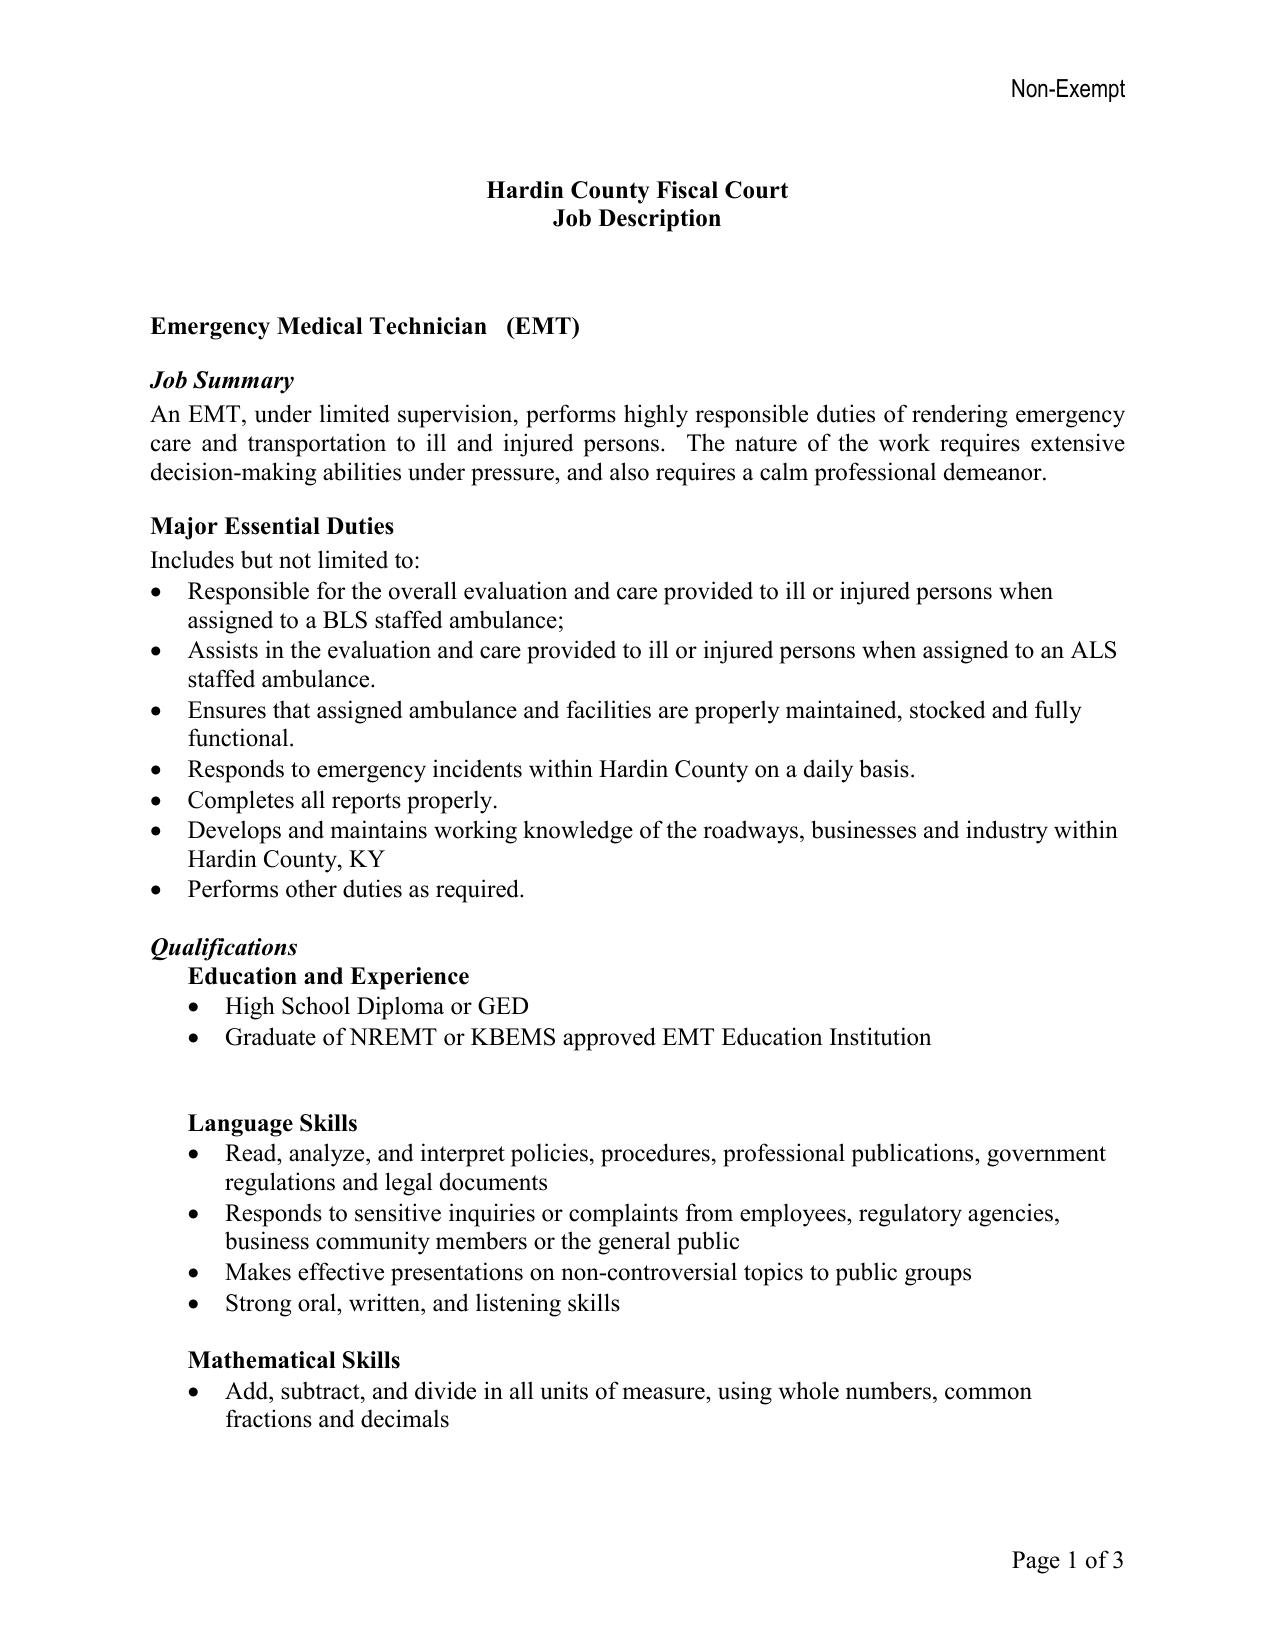 Job description for EMT's - Hardin County Government